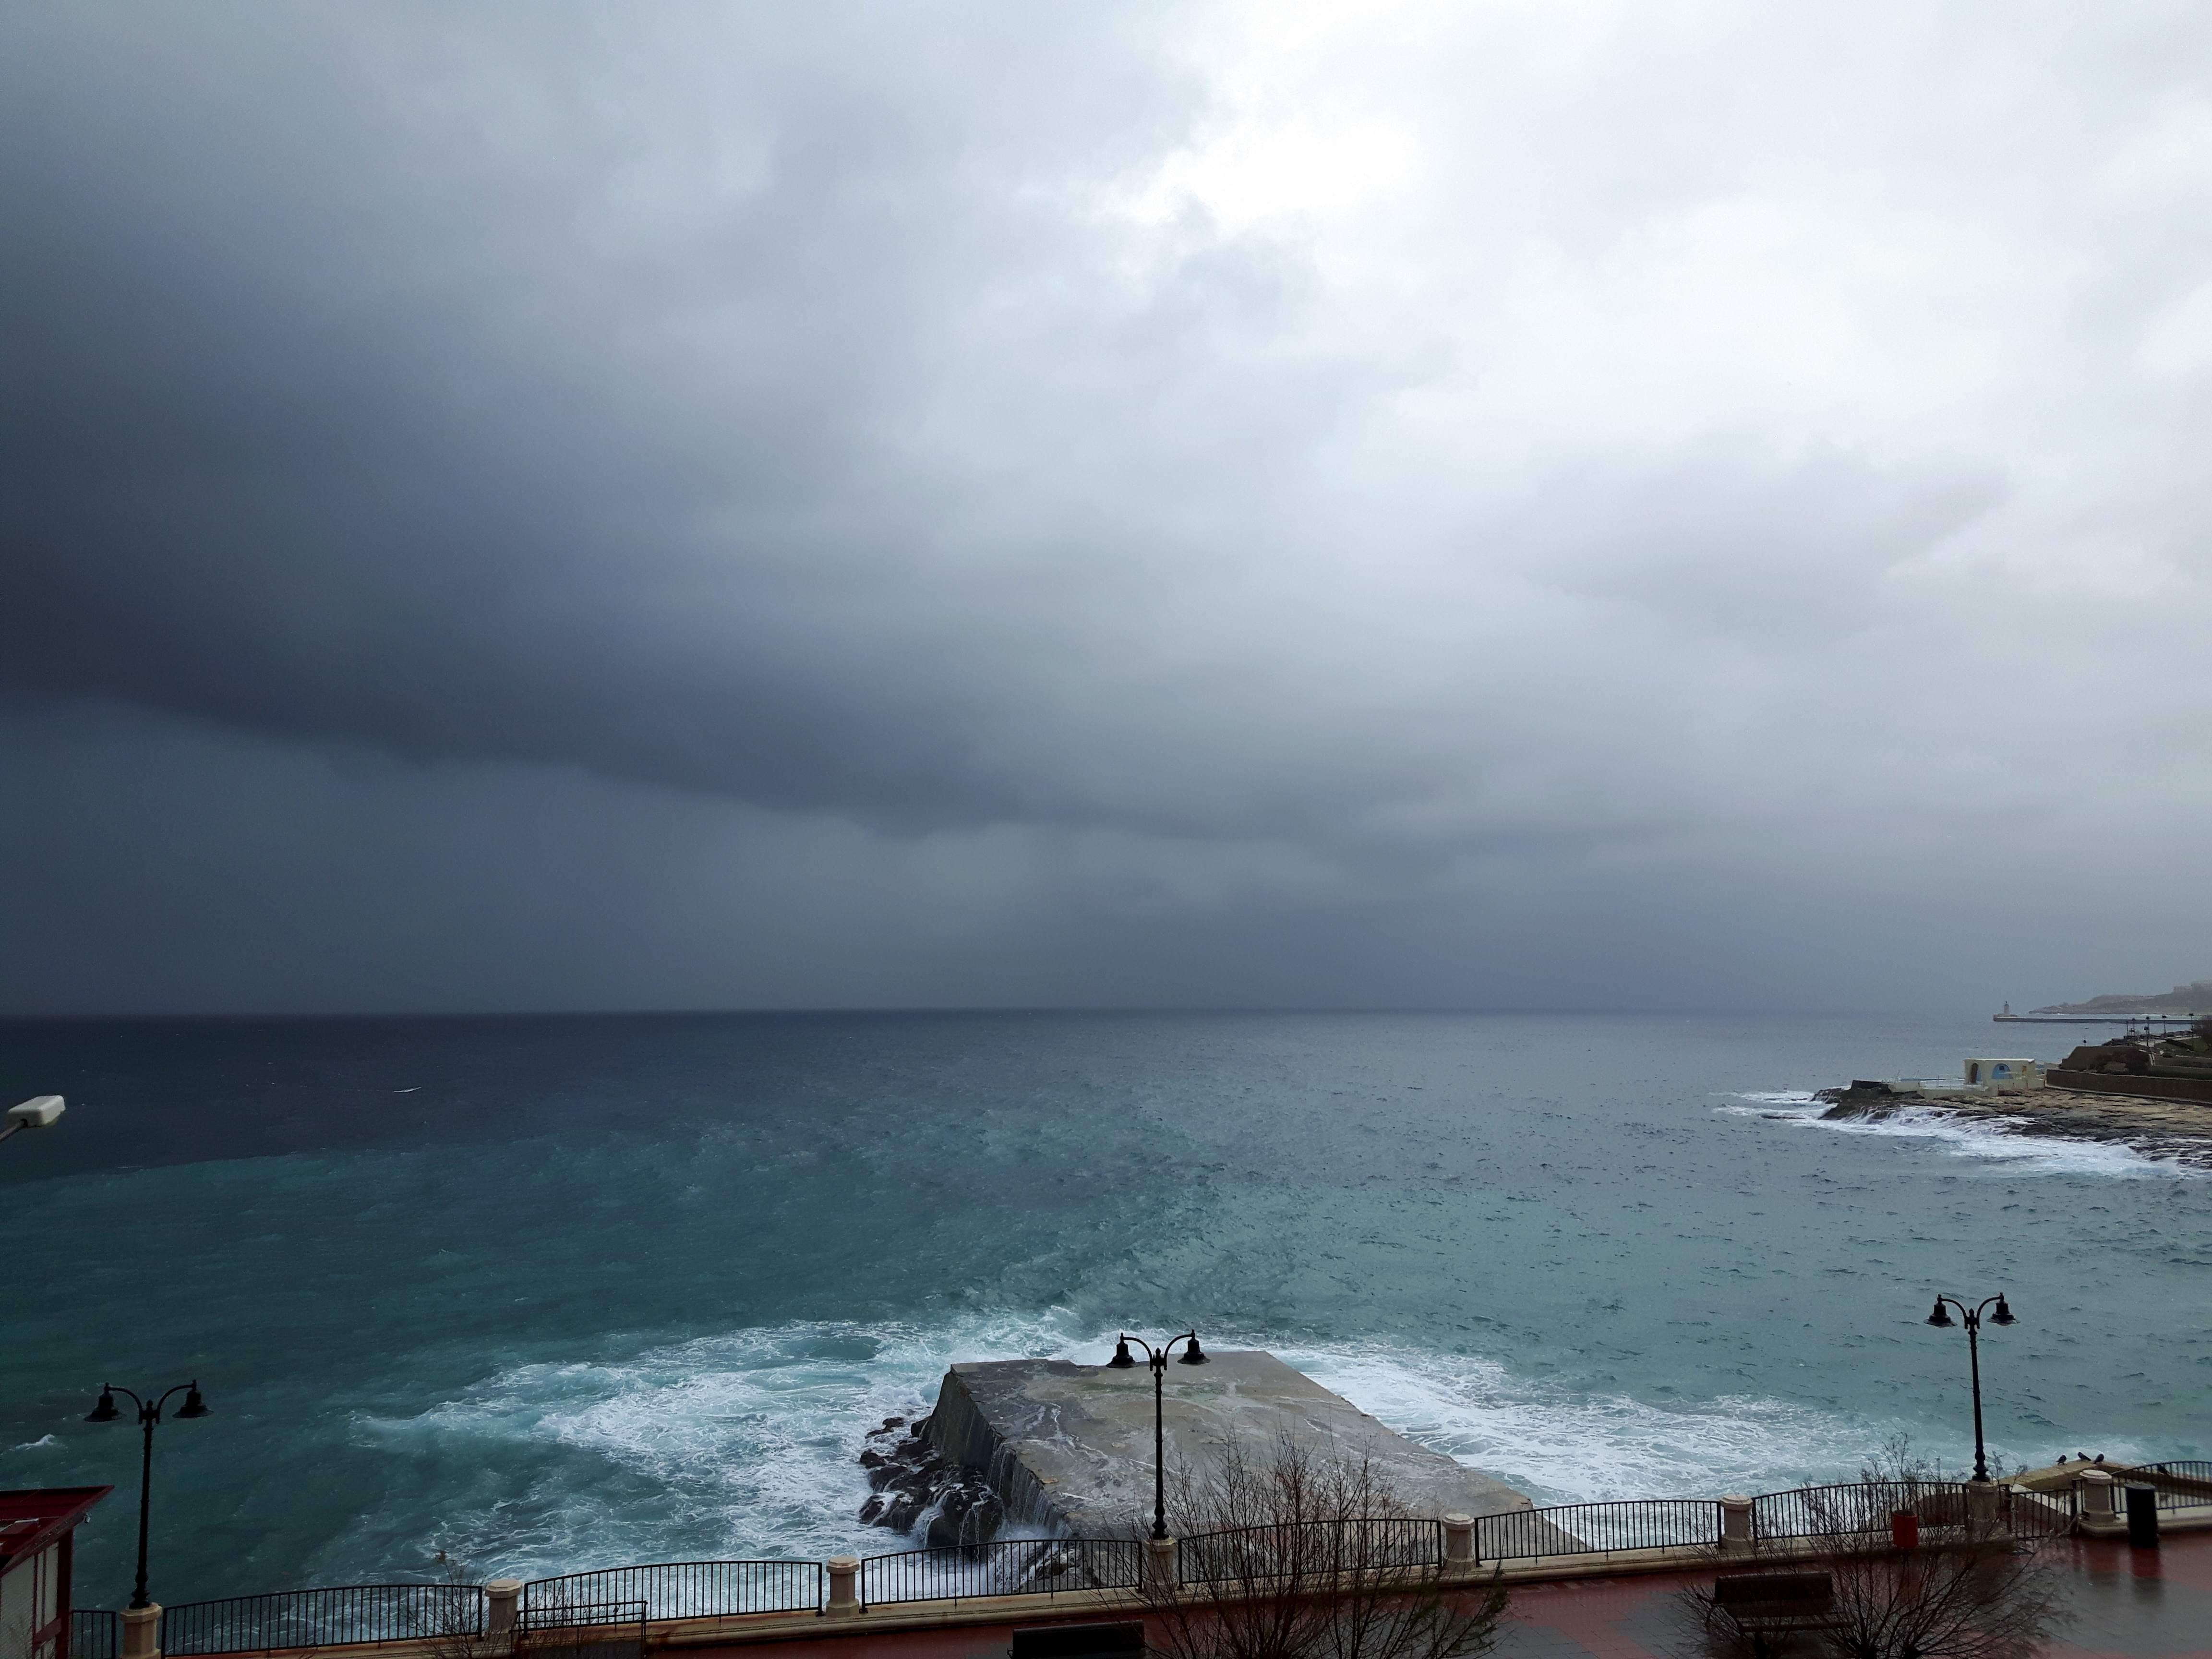 Stormy_Sky_Malta_Europe